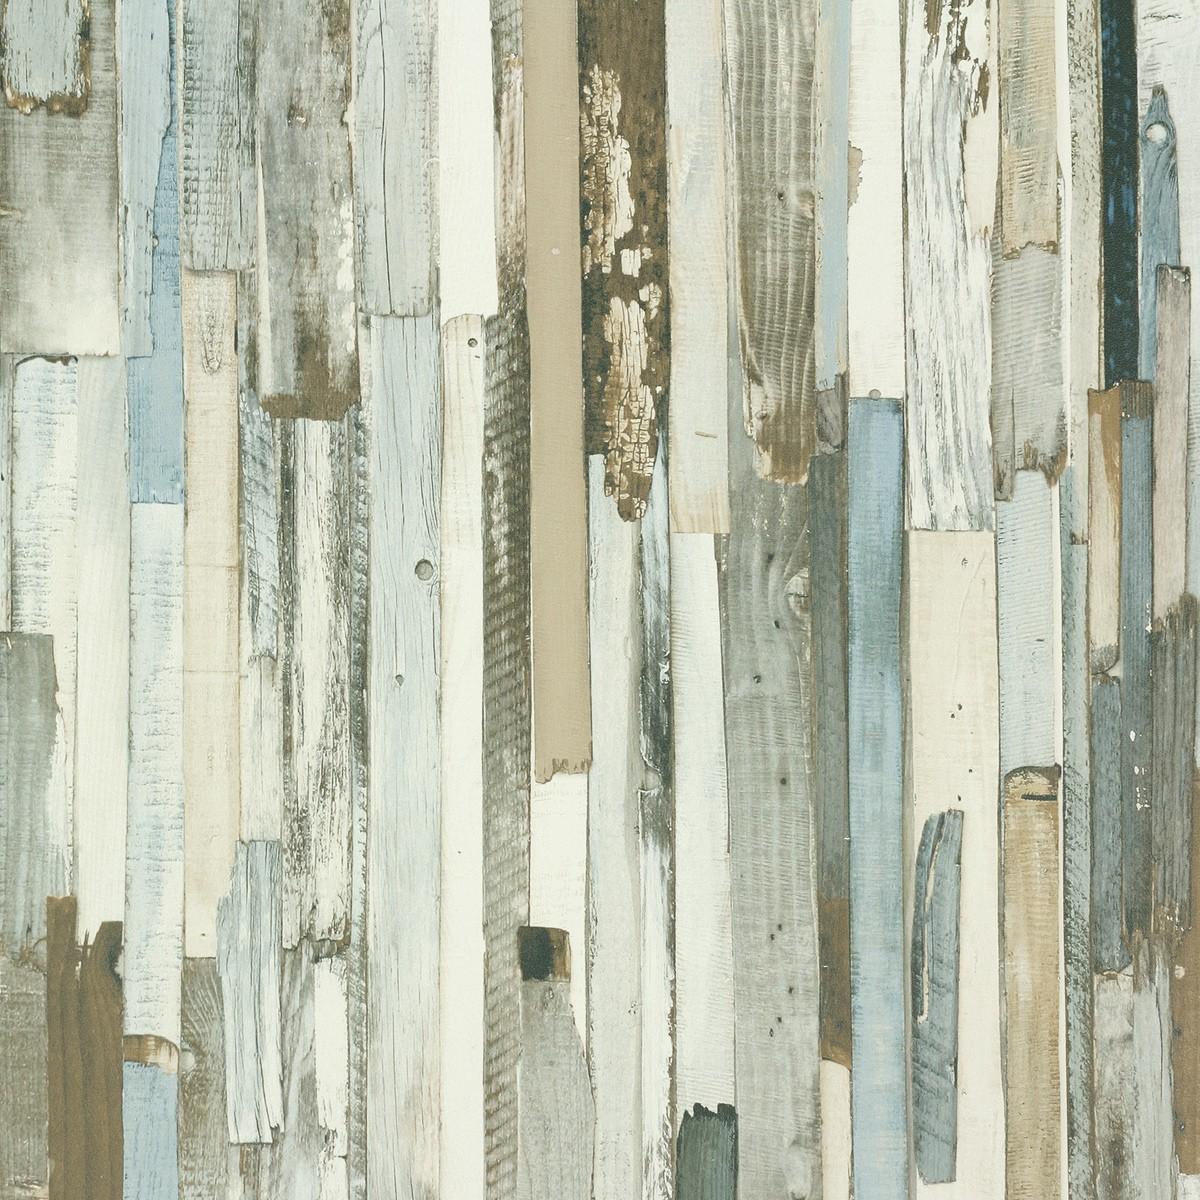 Tapete Holzoptik Beige Blau Rasch Textil New Age 319926